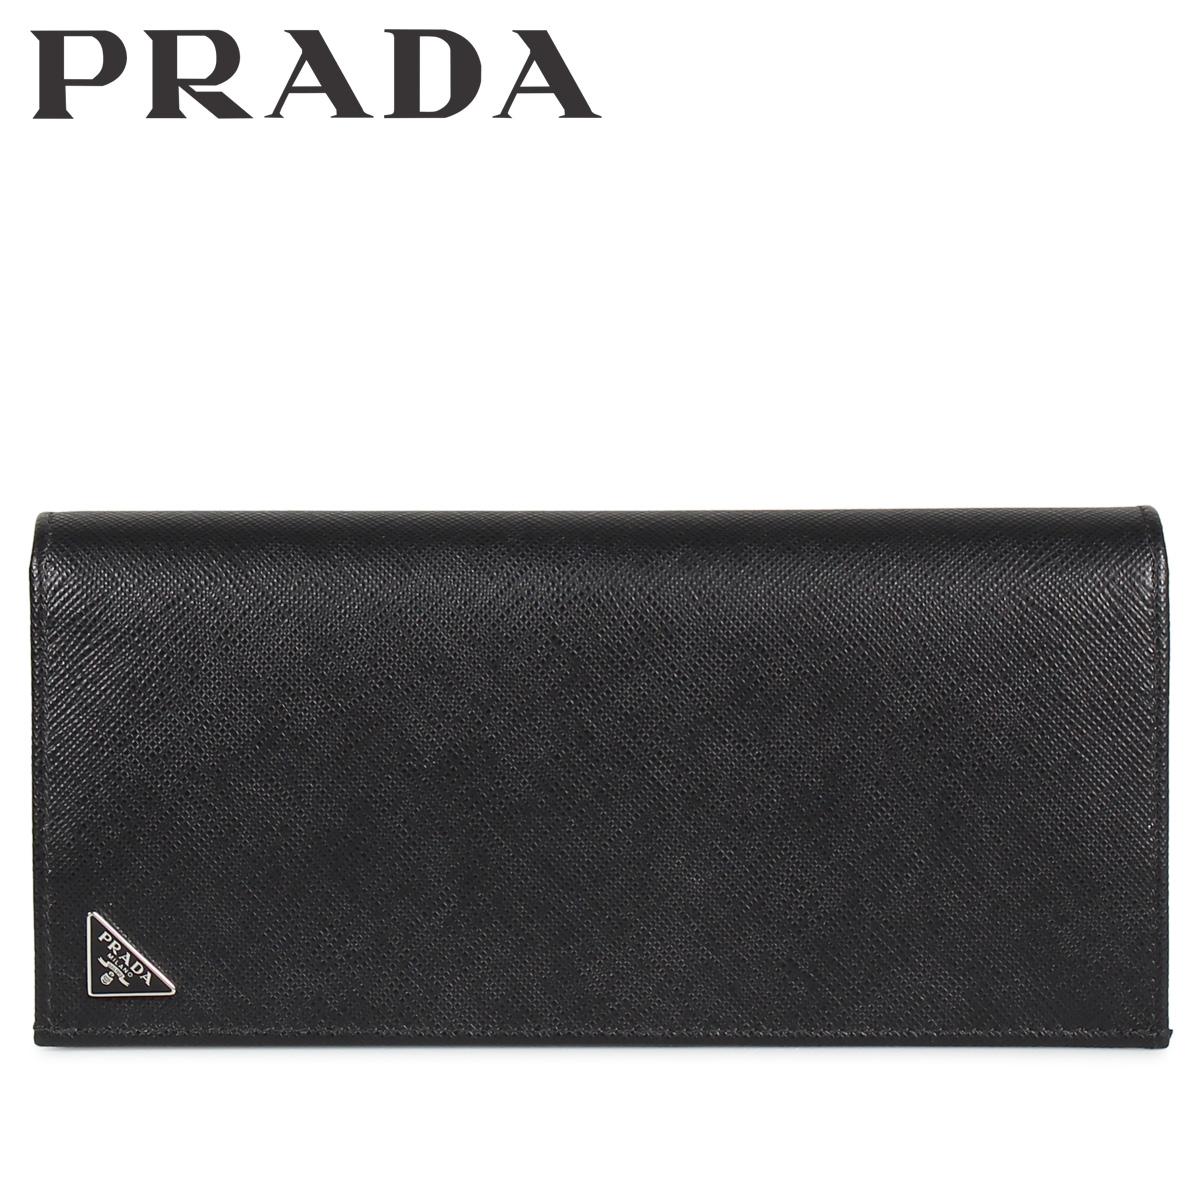 PRADA プラダ 財布 長財布 メンズ サフィアーノ VERTICAL WALLET ブラック 黒 2MV836QHH